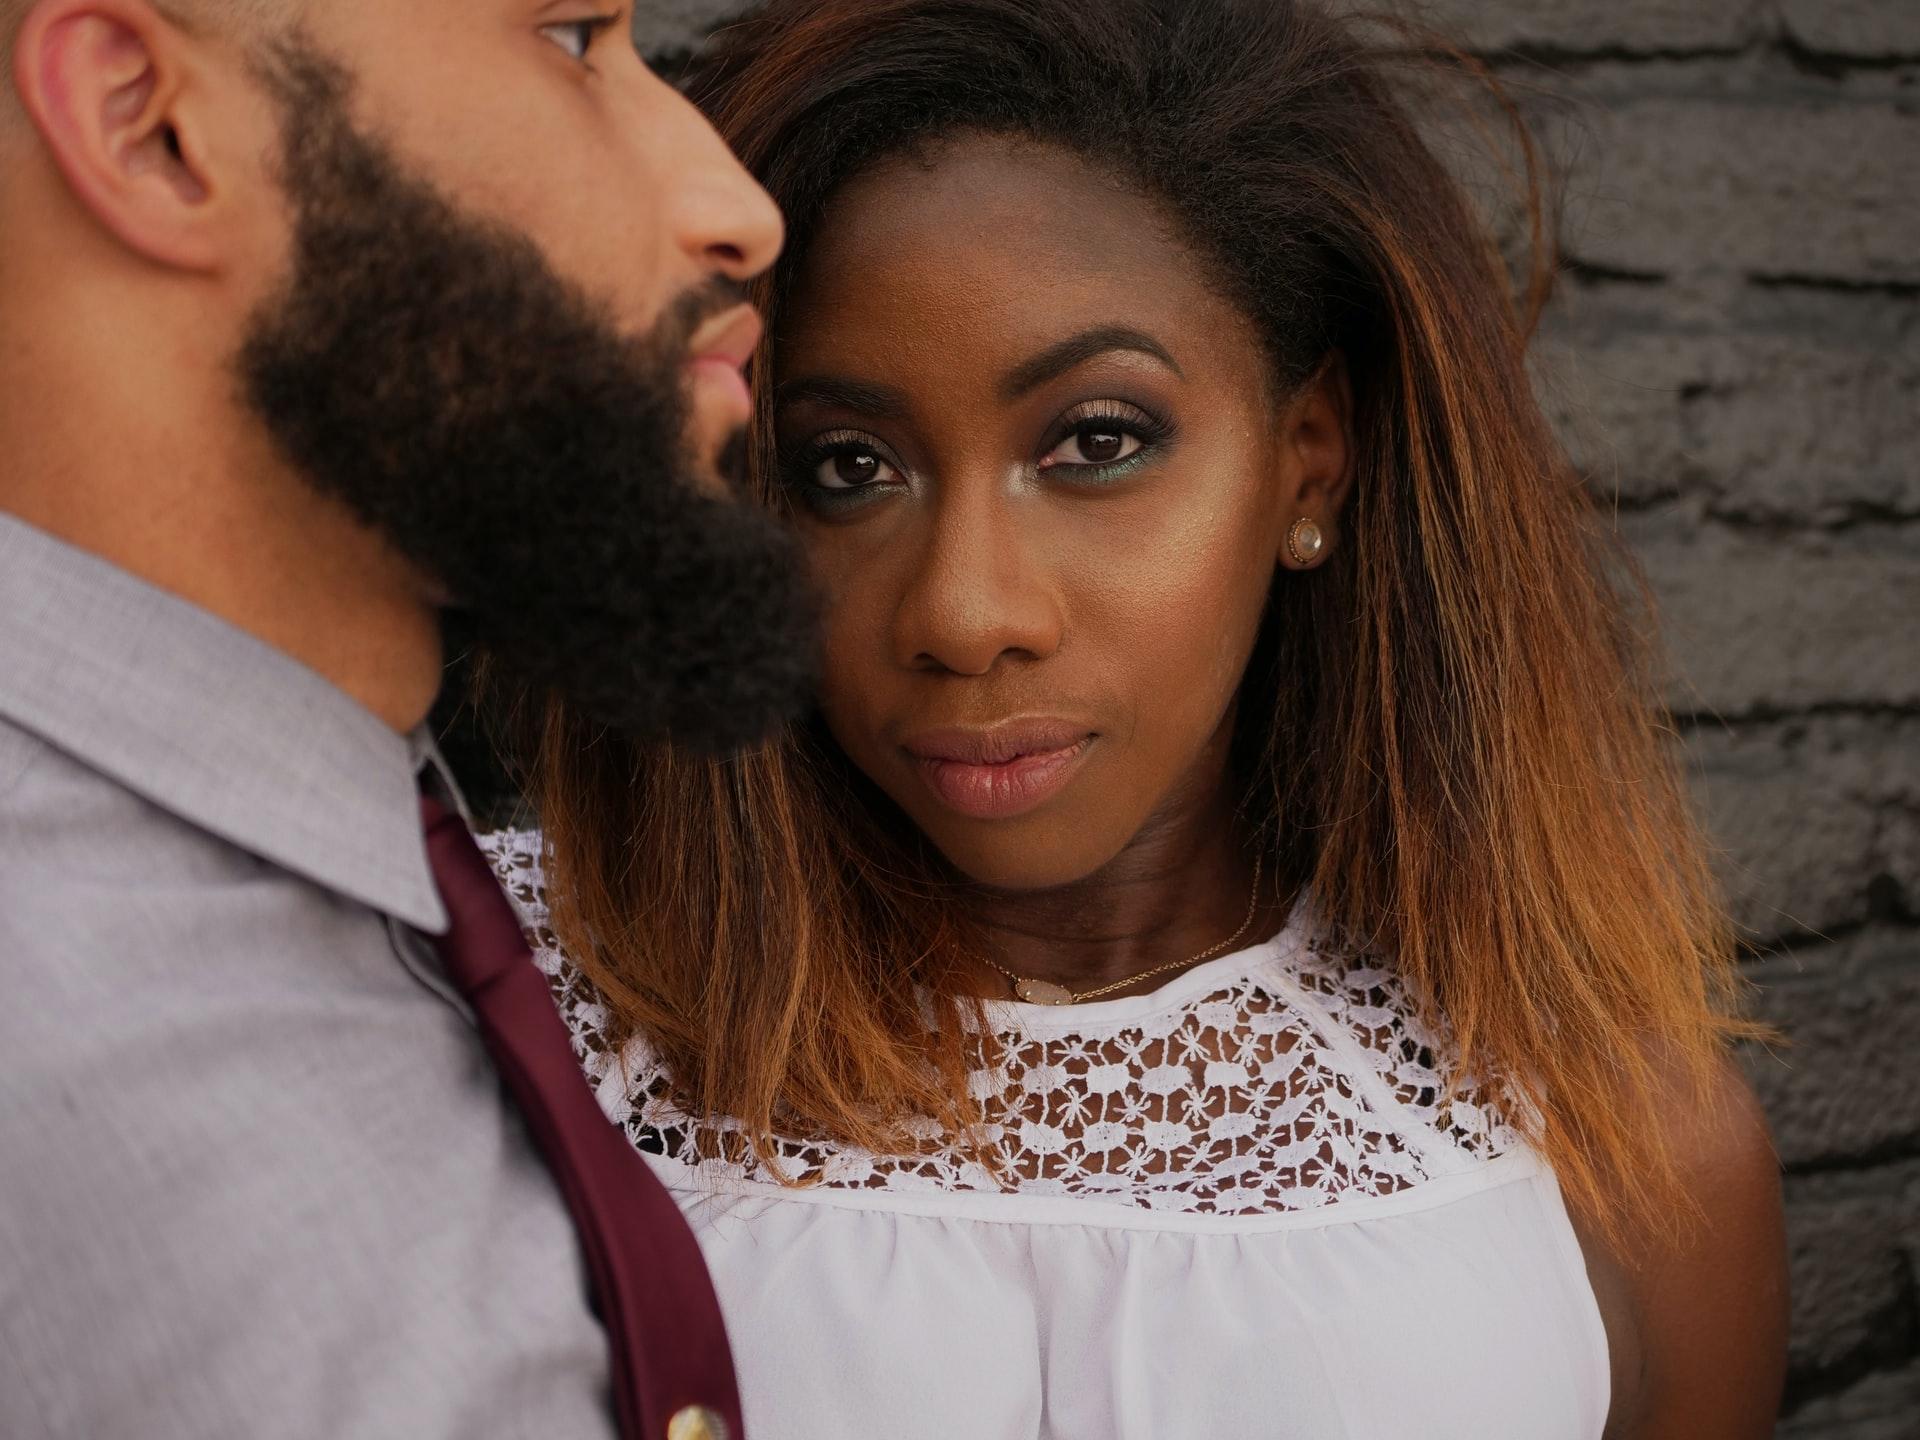 black woman wearing white shirt beside man